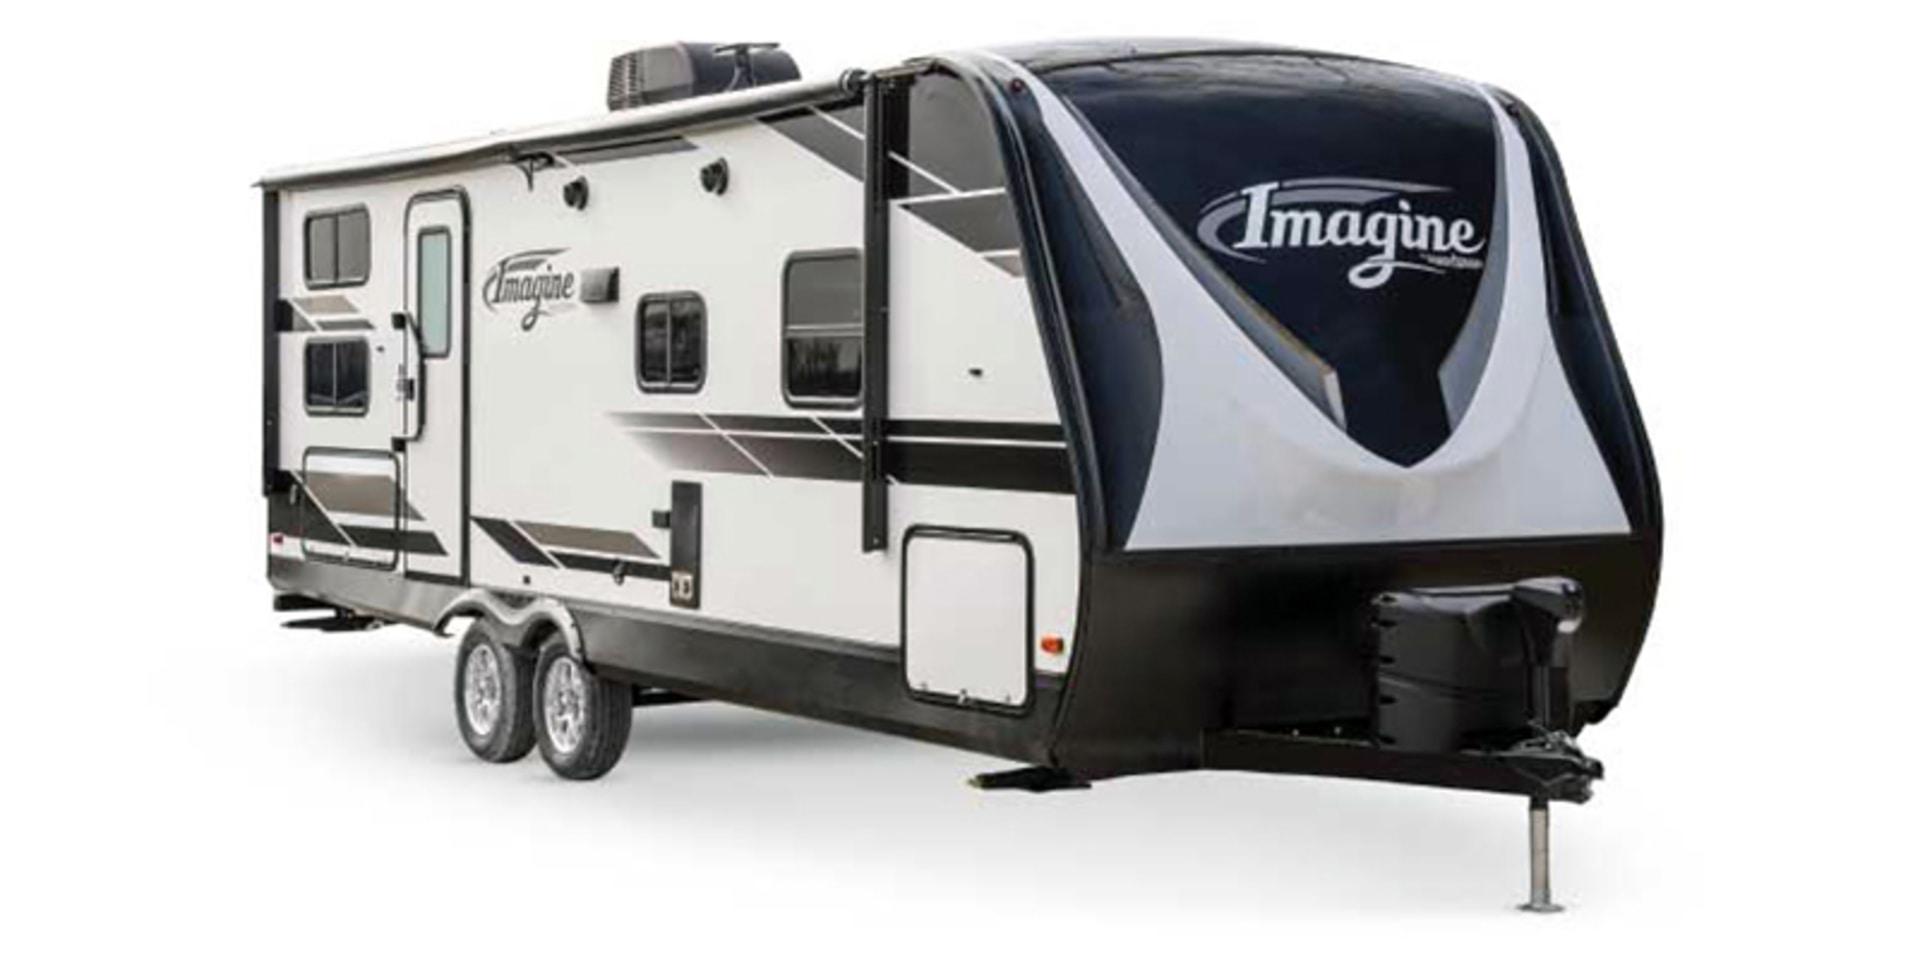 New, 2021, Grand Design, Imagine 2670MK, Travel Trailers